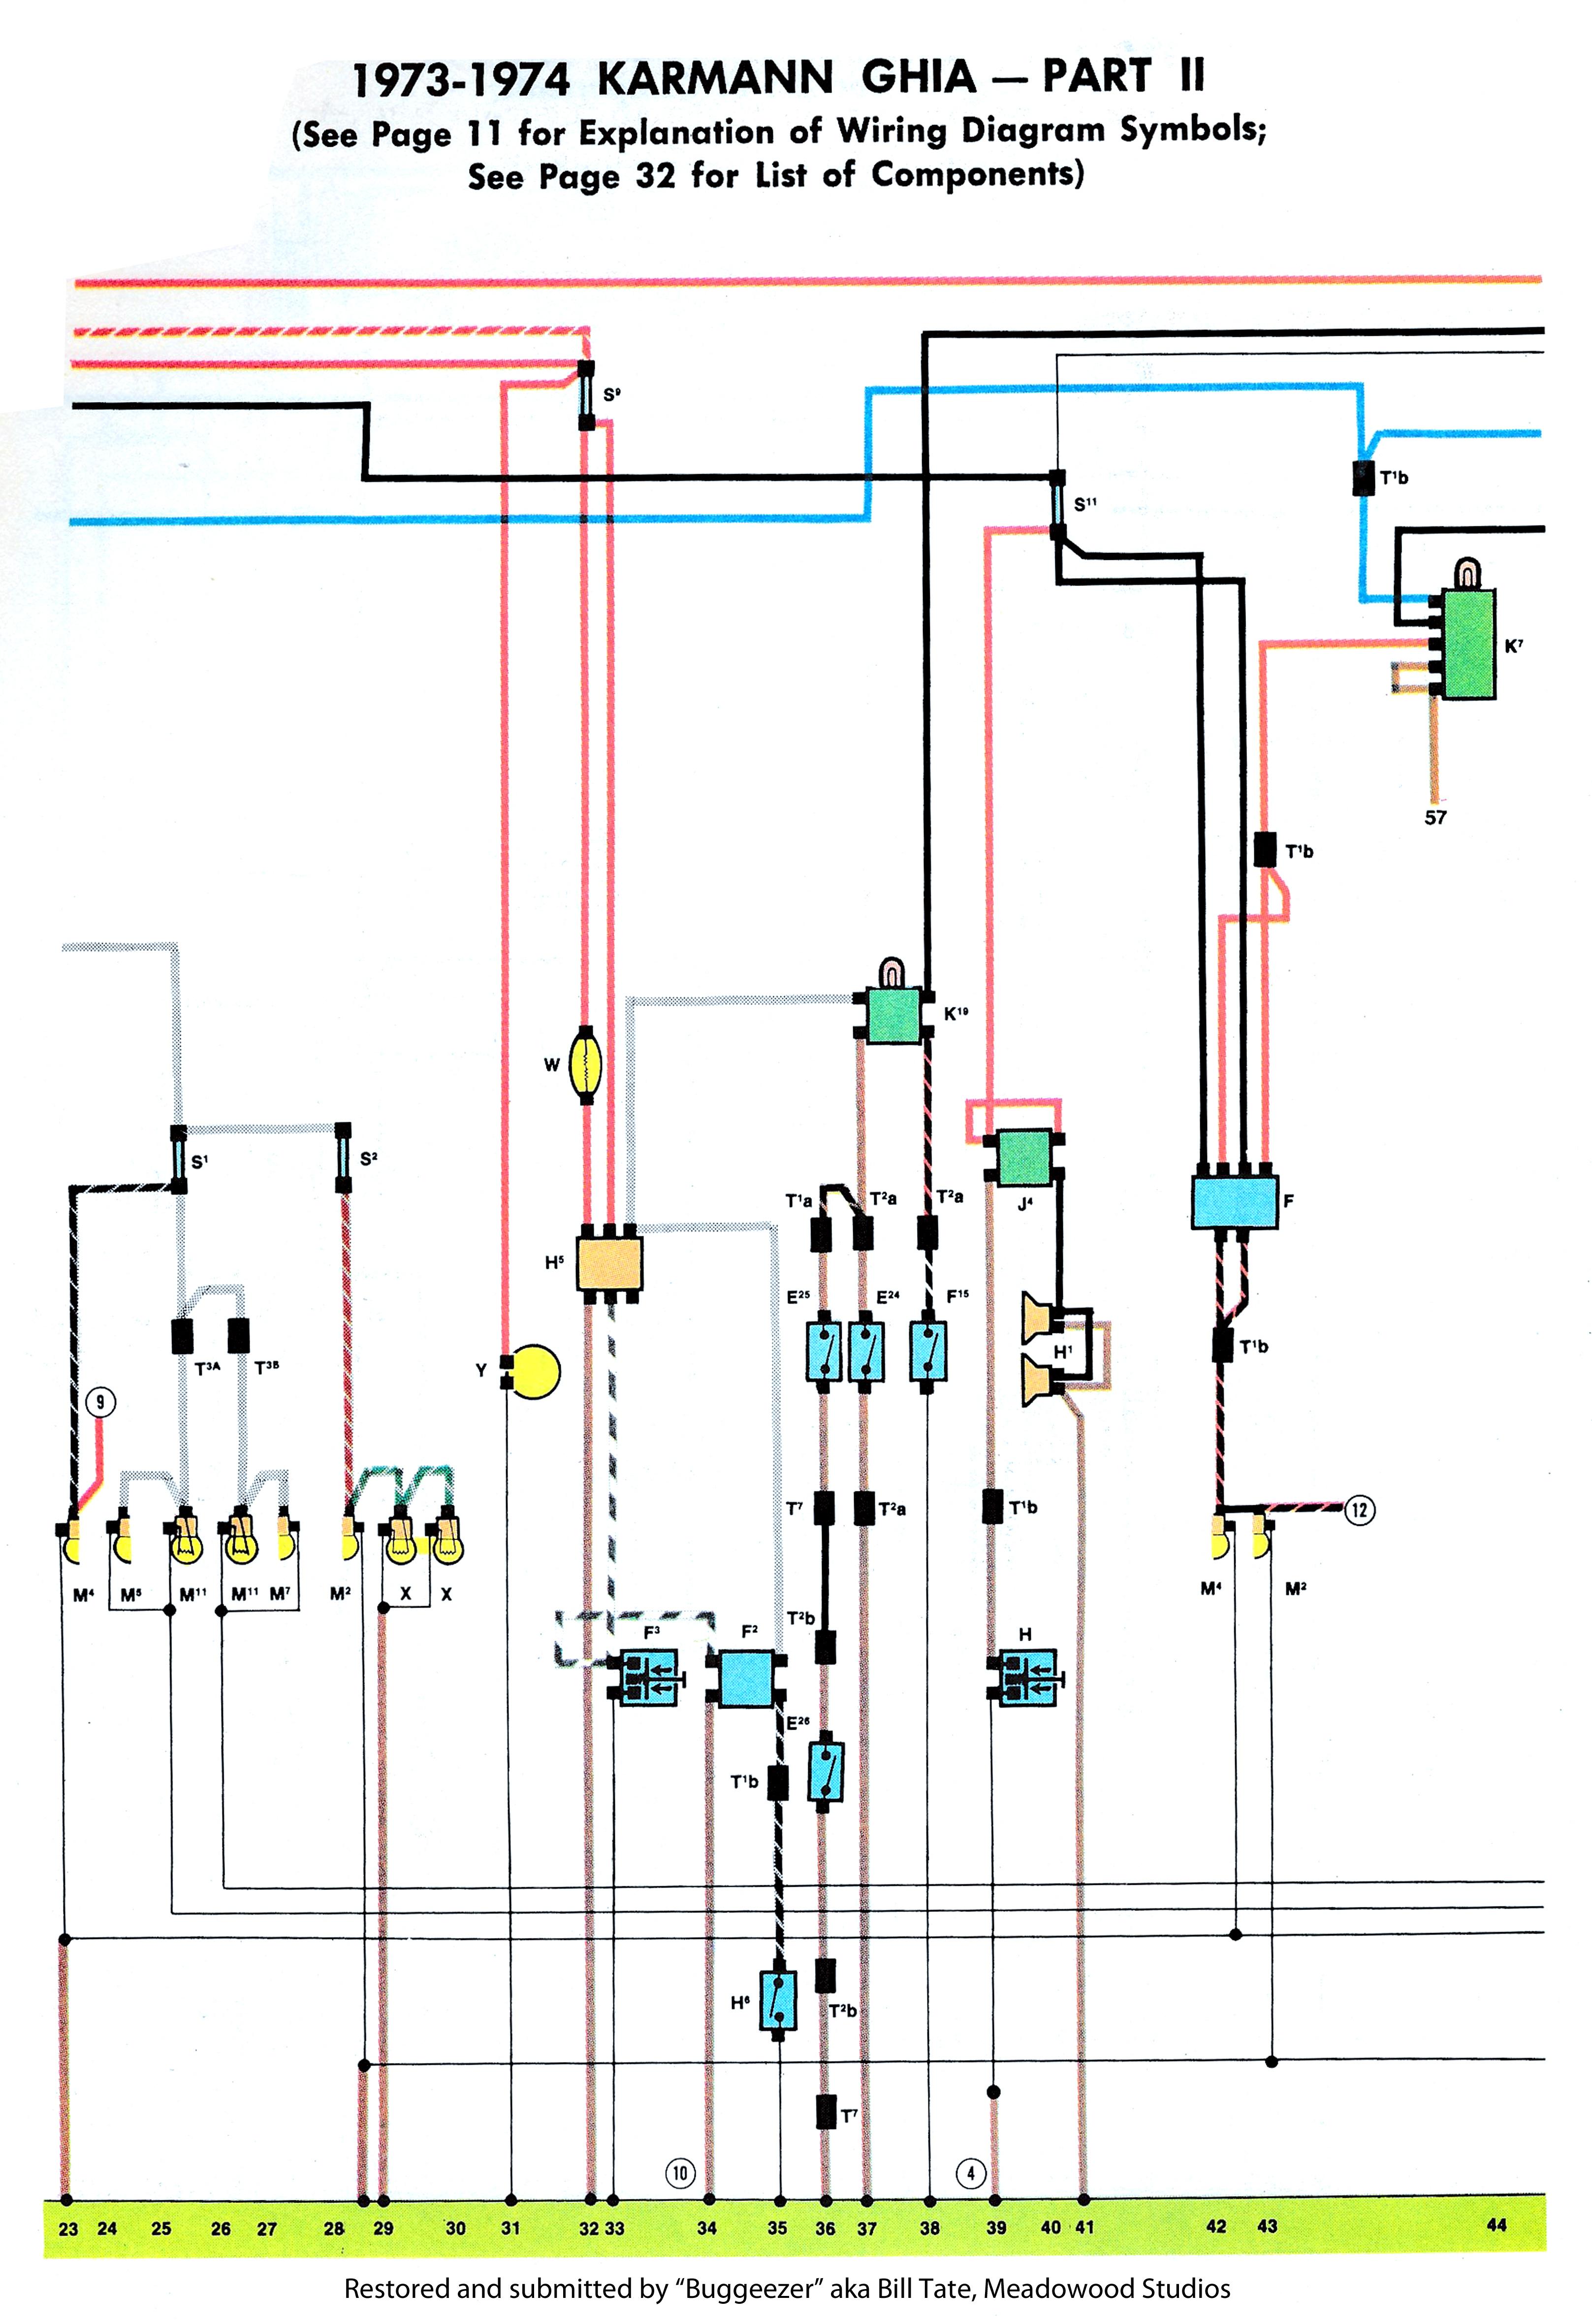 Beetle Fuse Diagram Wiring Schematic Thesamba Com Karmann Ghia Wiring Diagrams